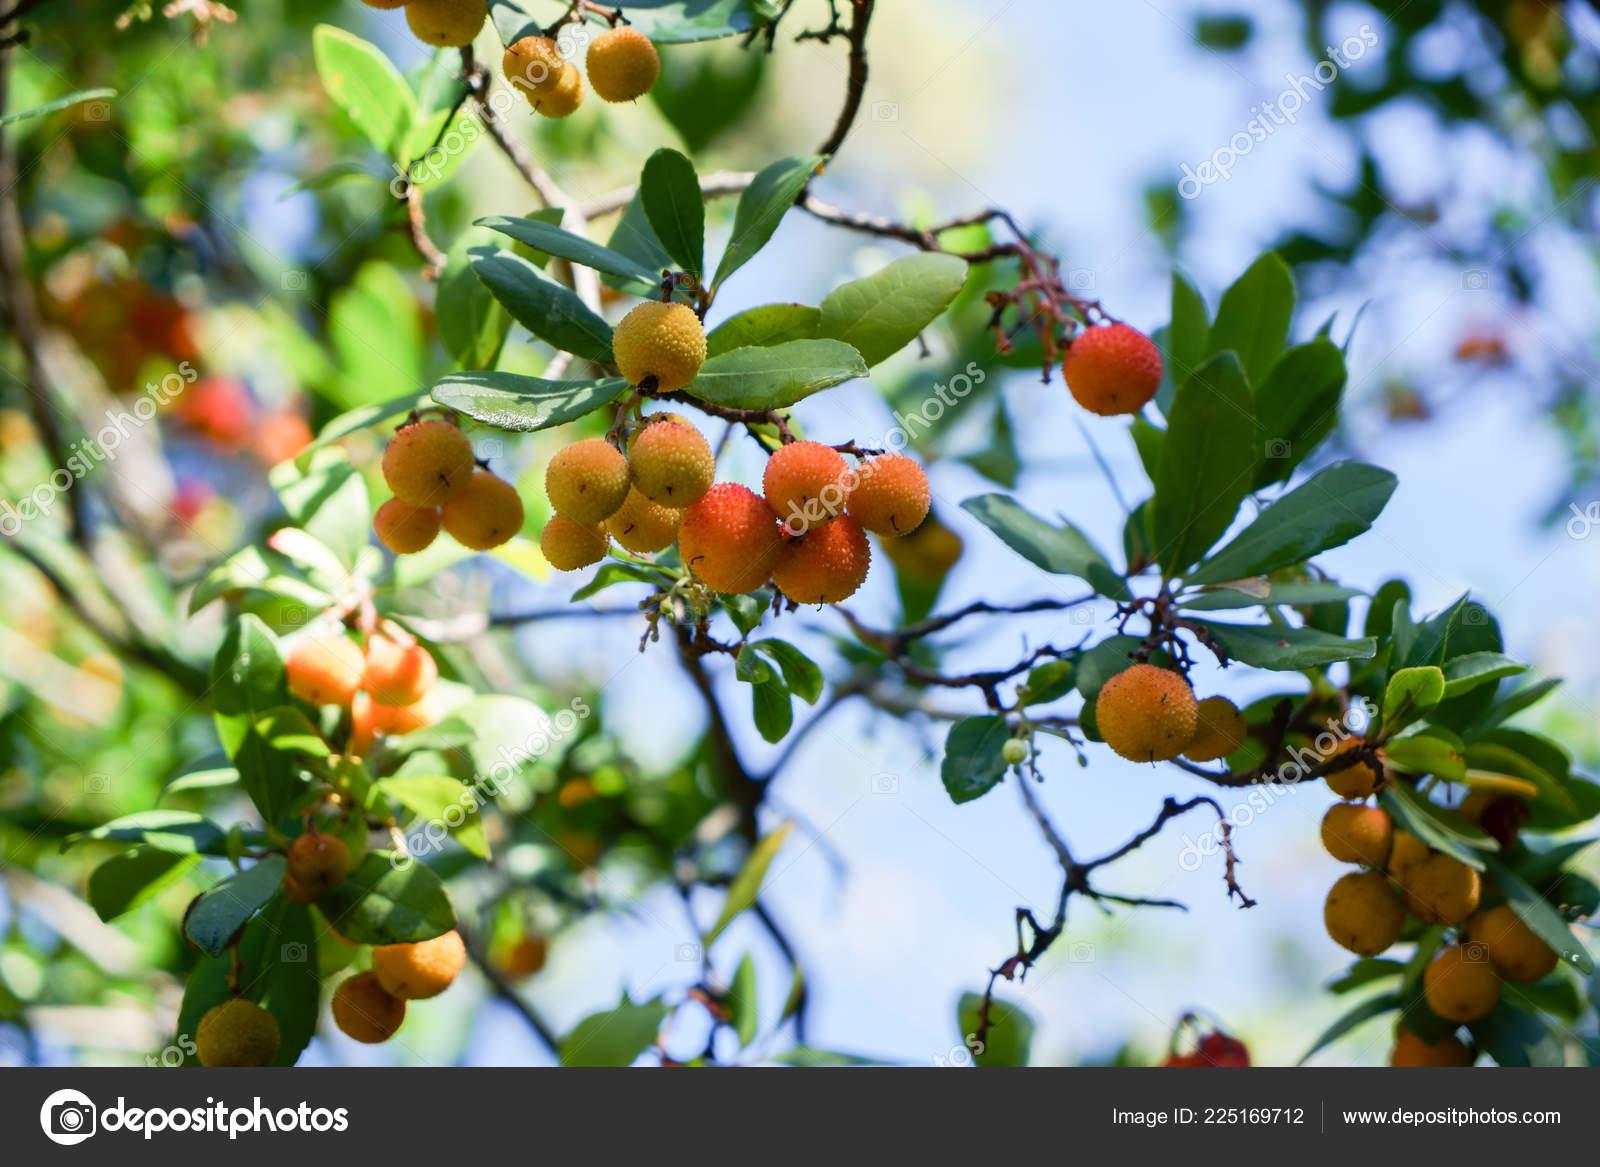 arbutus tree ripe strawberry tree fruits granada stock photo